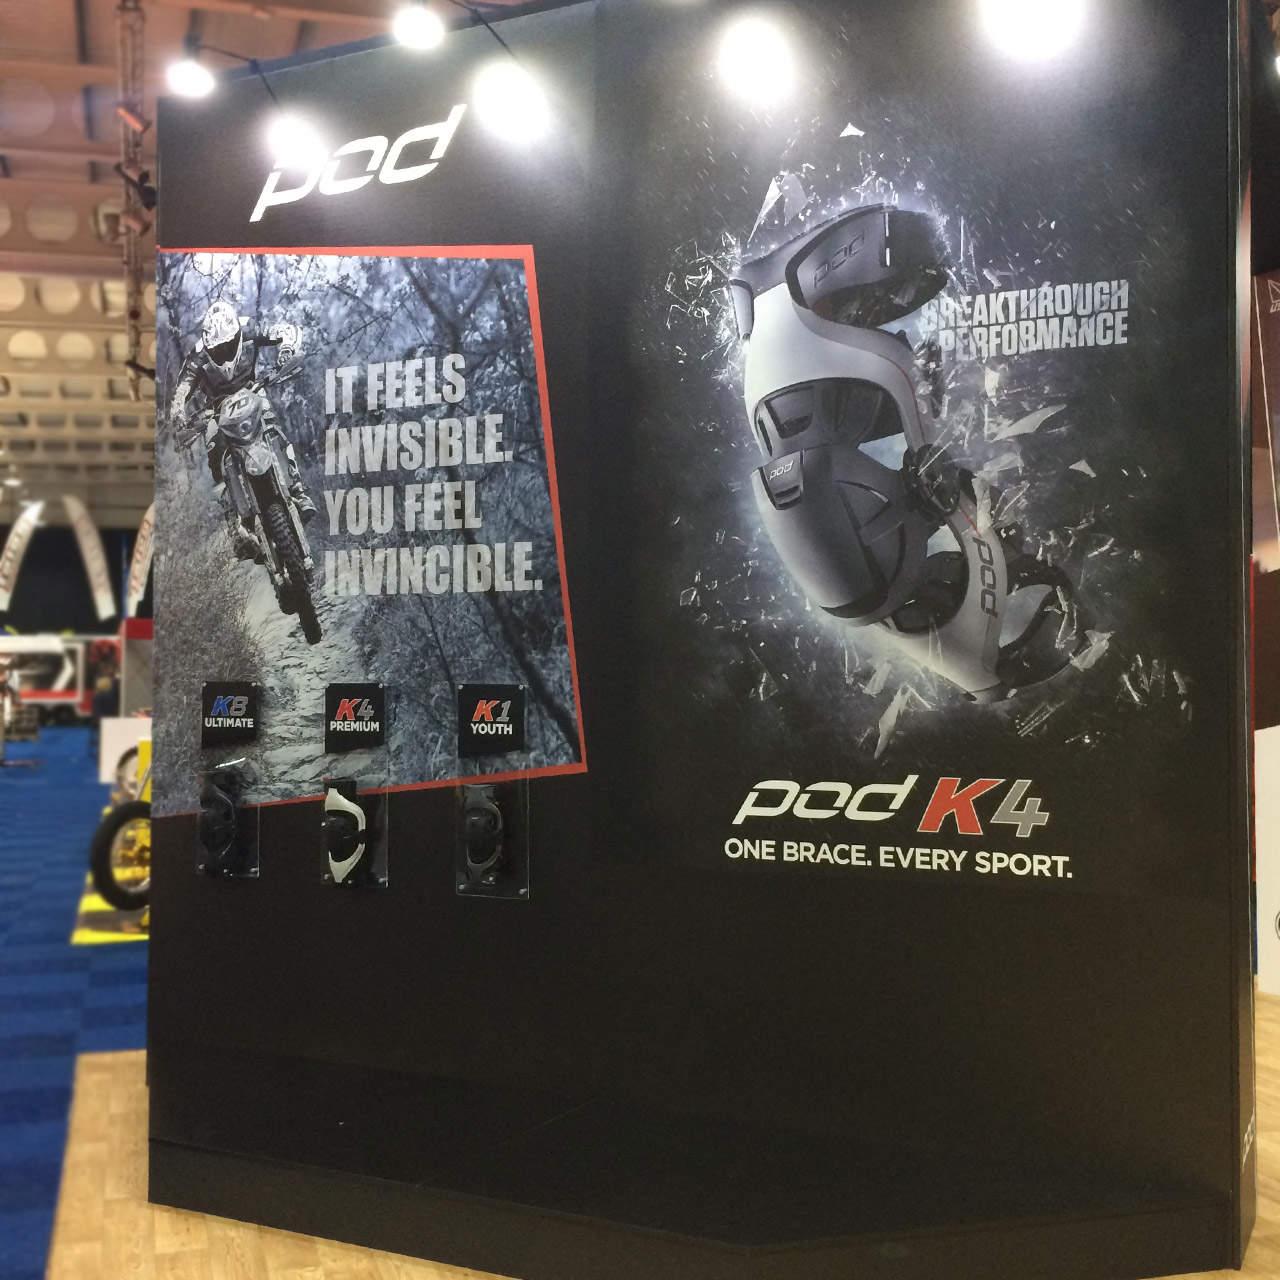 Dirt Bike Show UK - POD stand